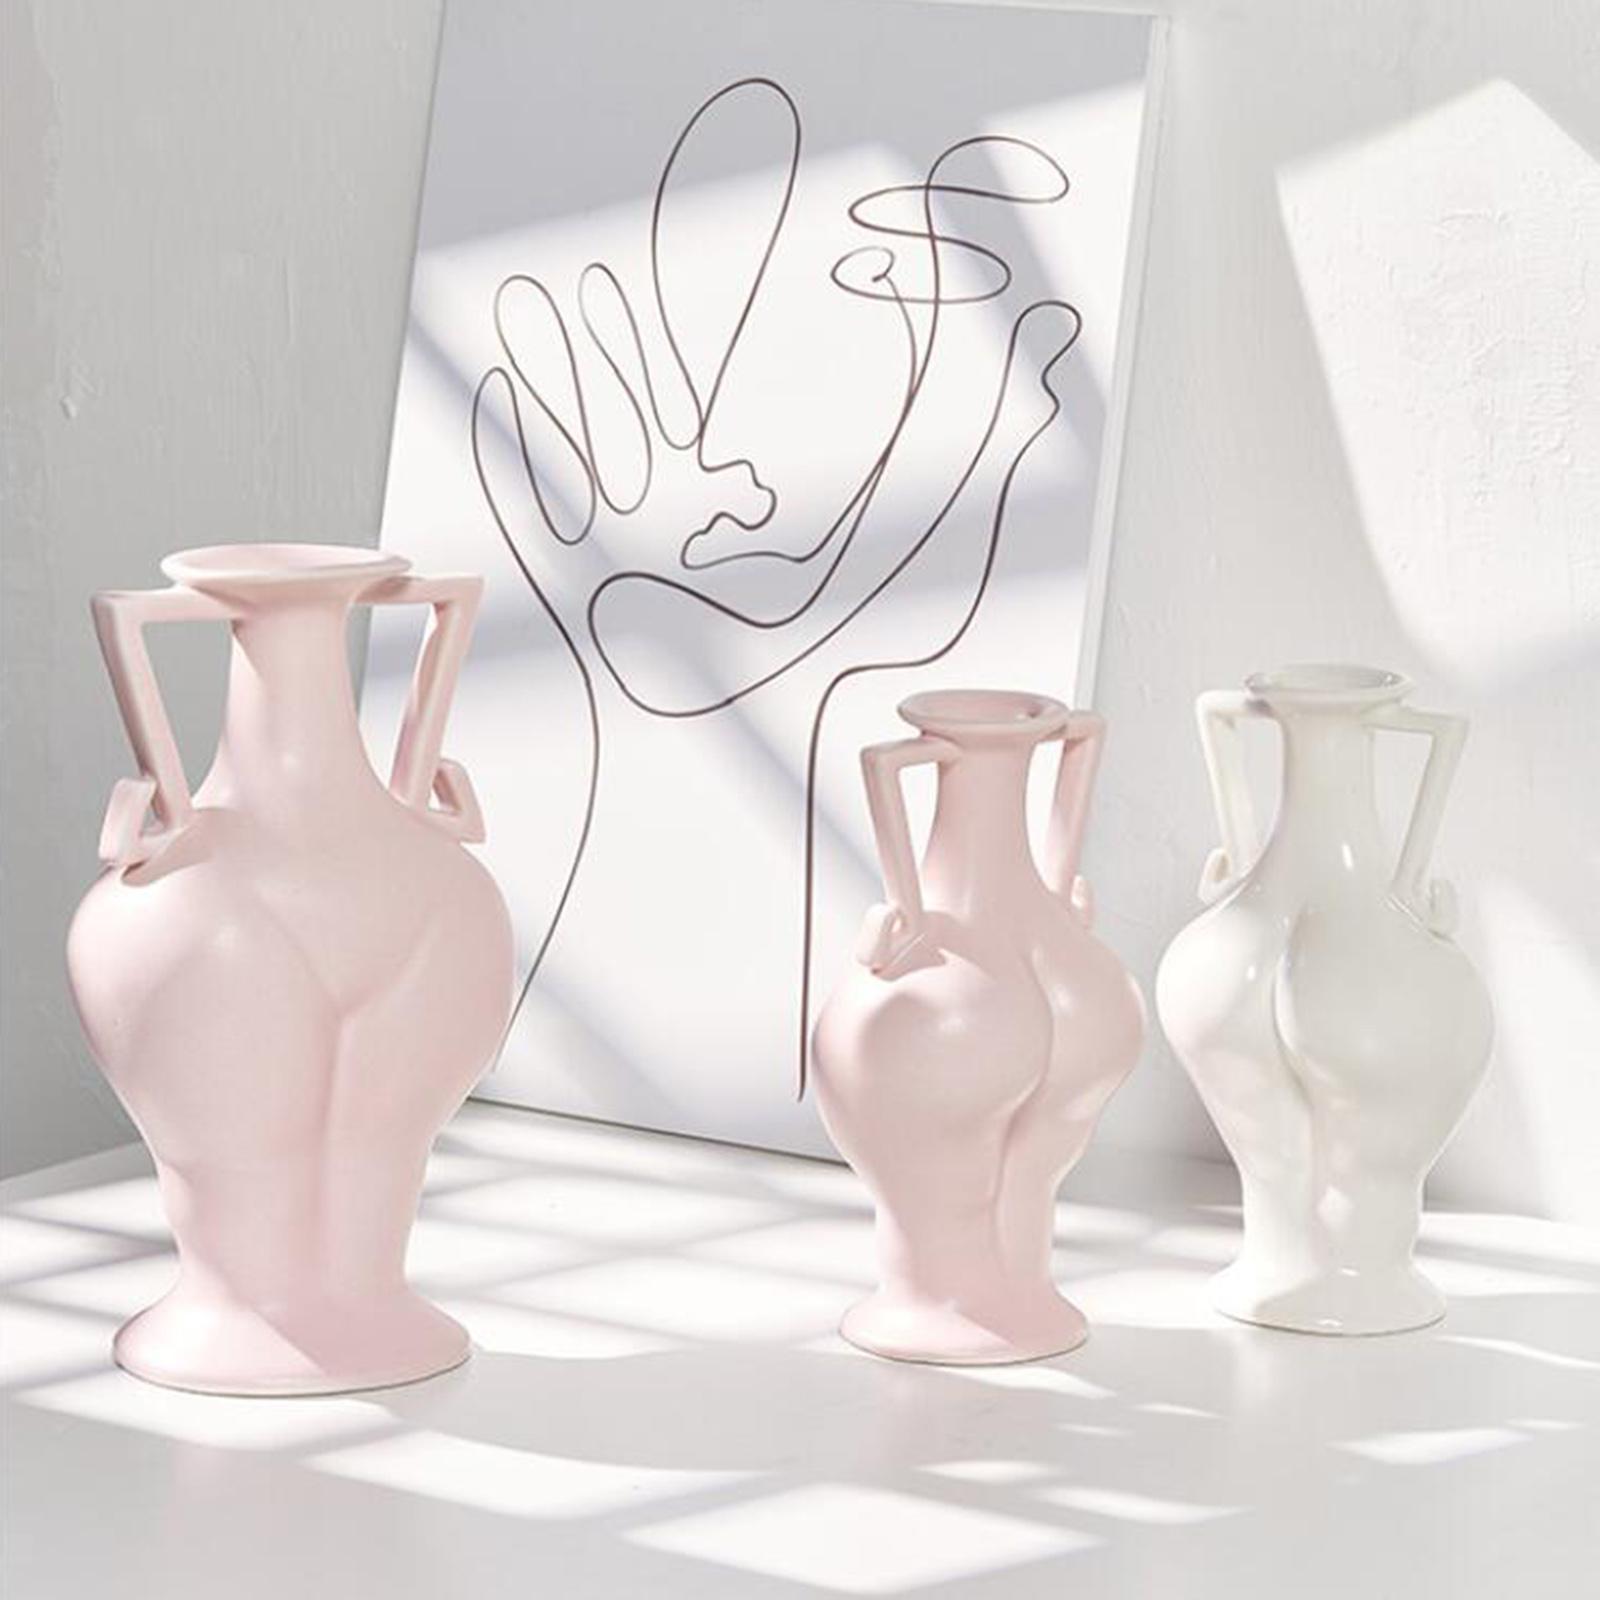 Indexbild 19 - Blumenvase Keramik Blumentöpfe Trockenblumenhalter Pflanzenvasen Wohnkultur